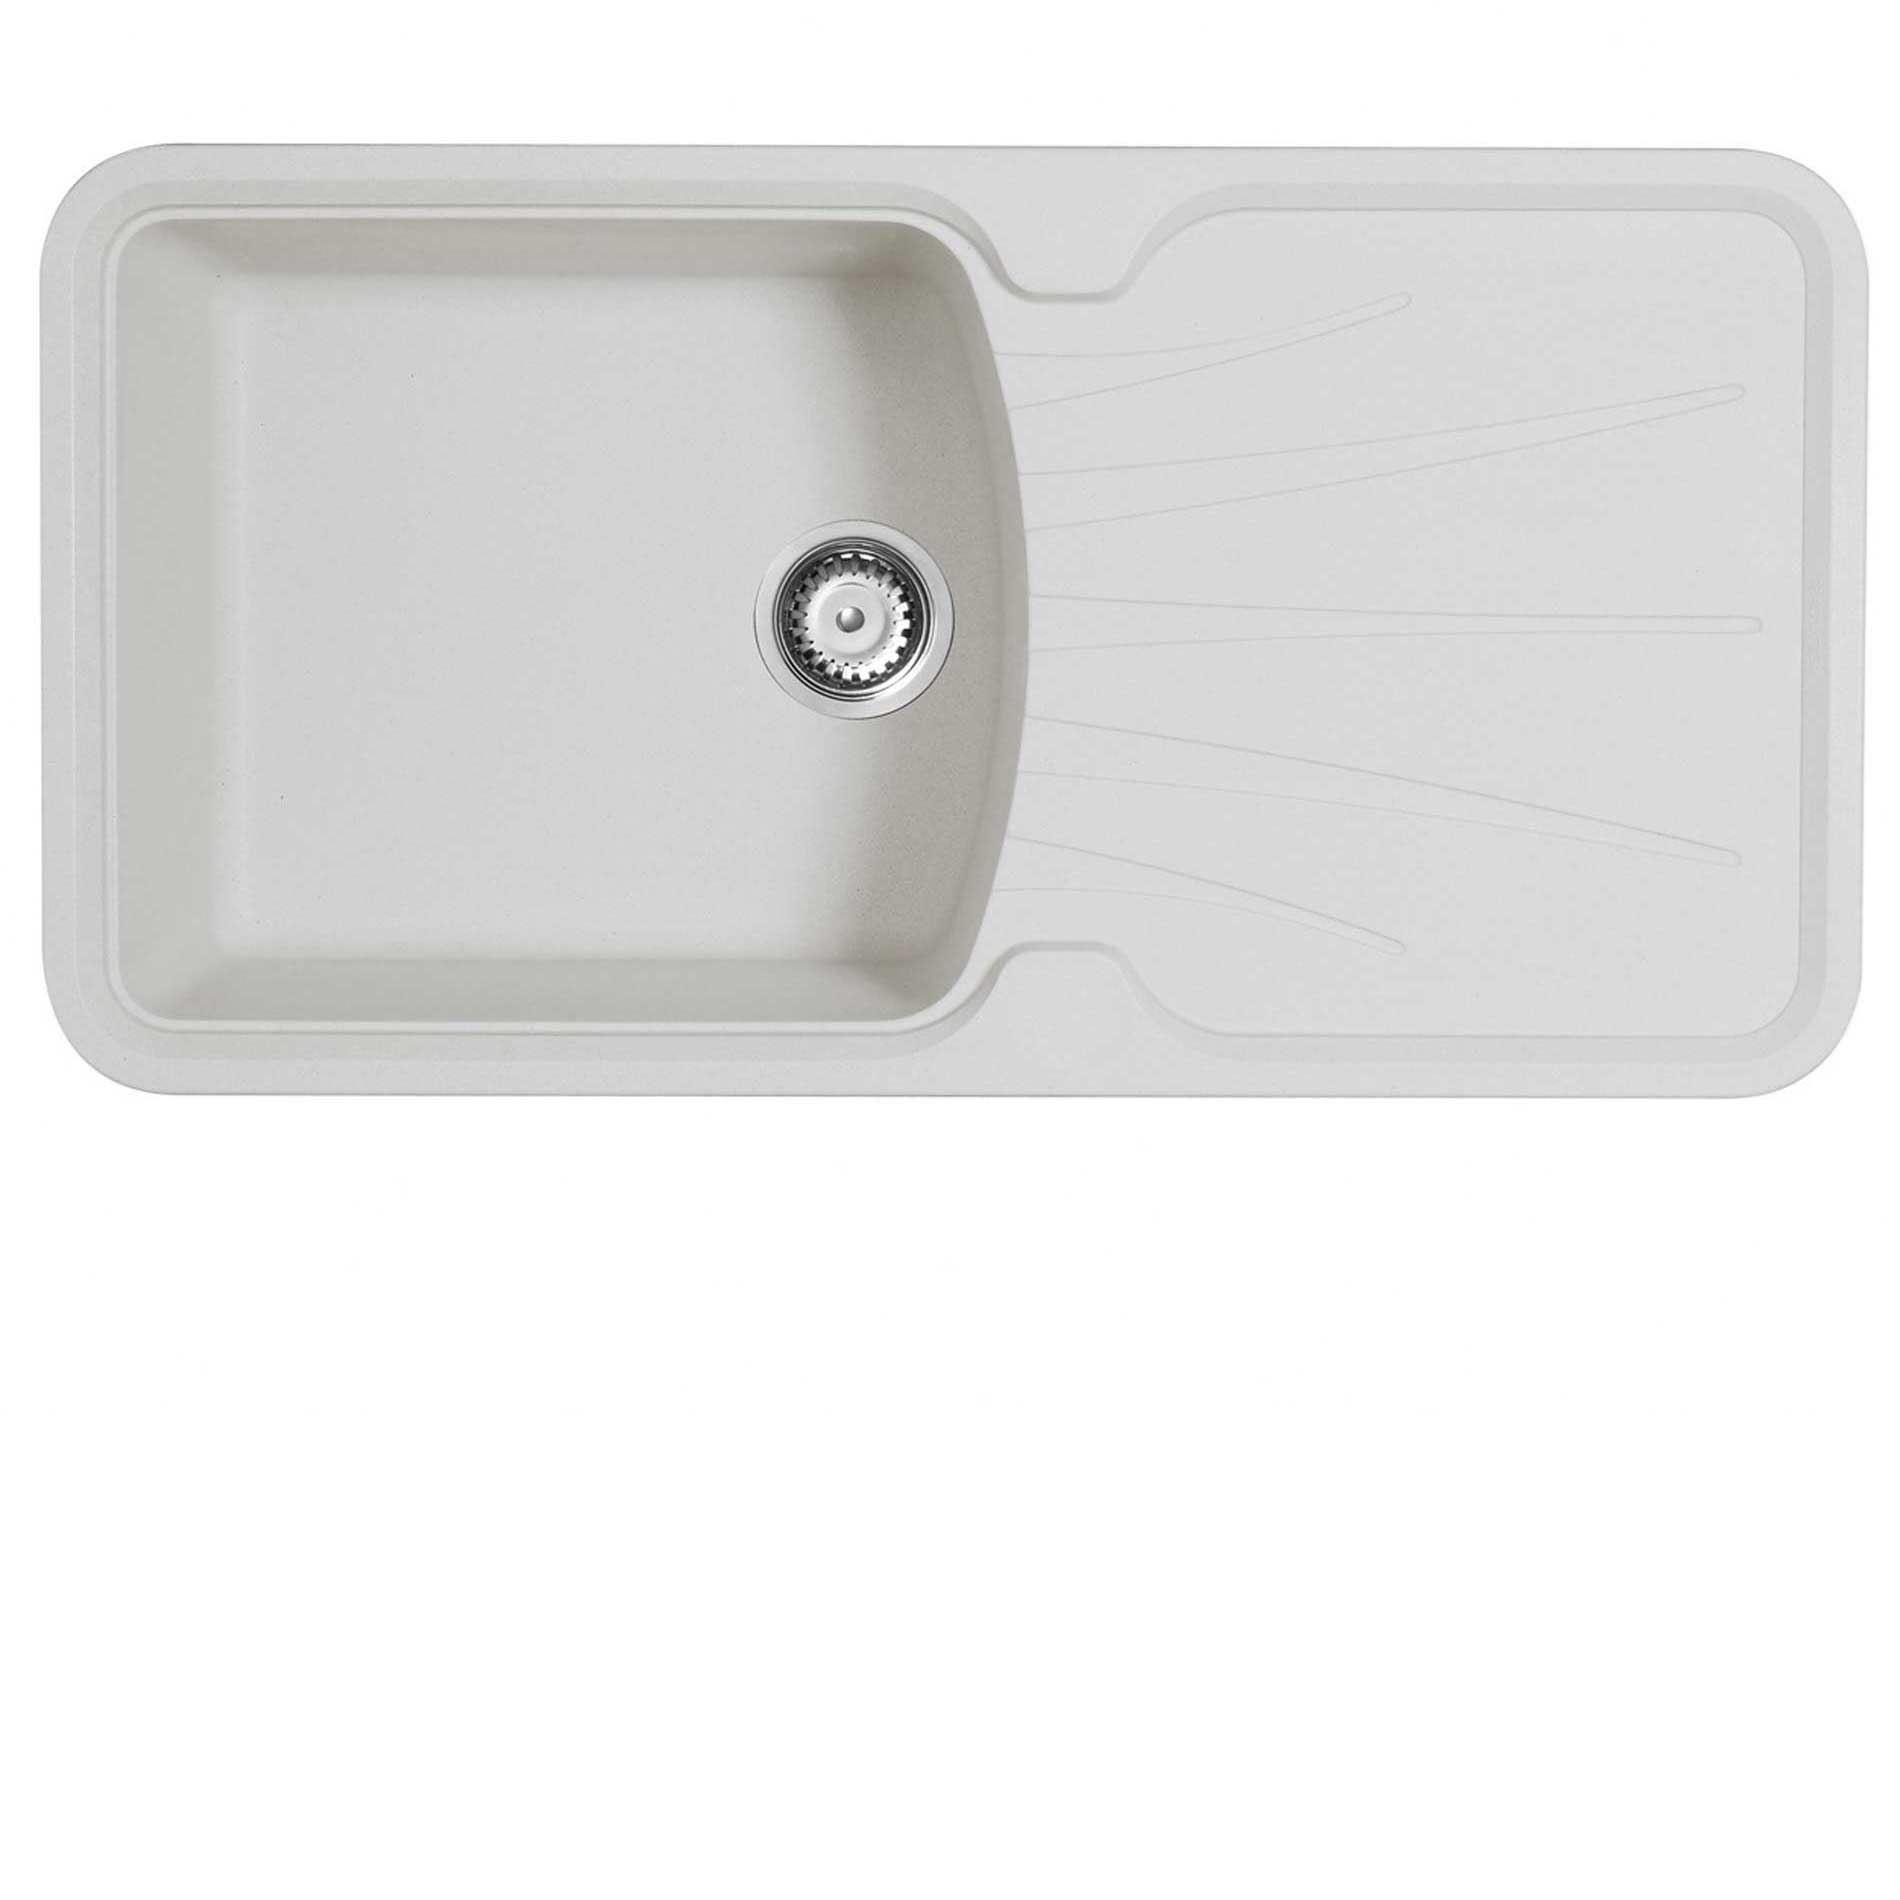 Astracast: Korona 1-0 Granite ROK Opal White Sink - Kitchen Sinks & Taps